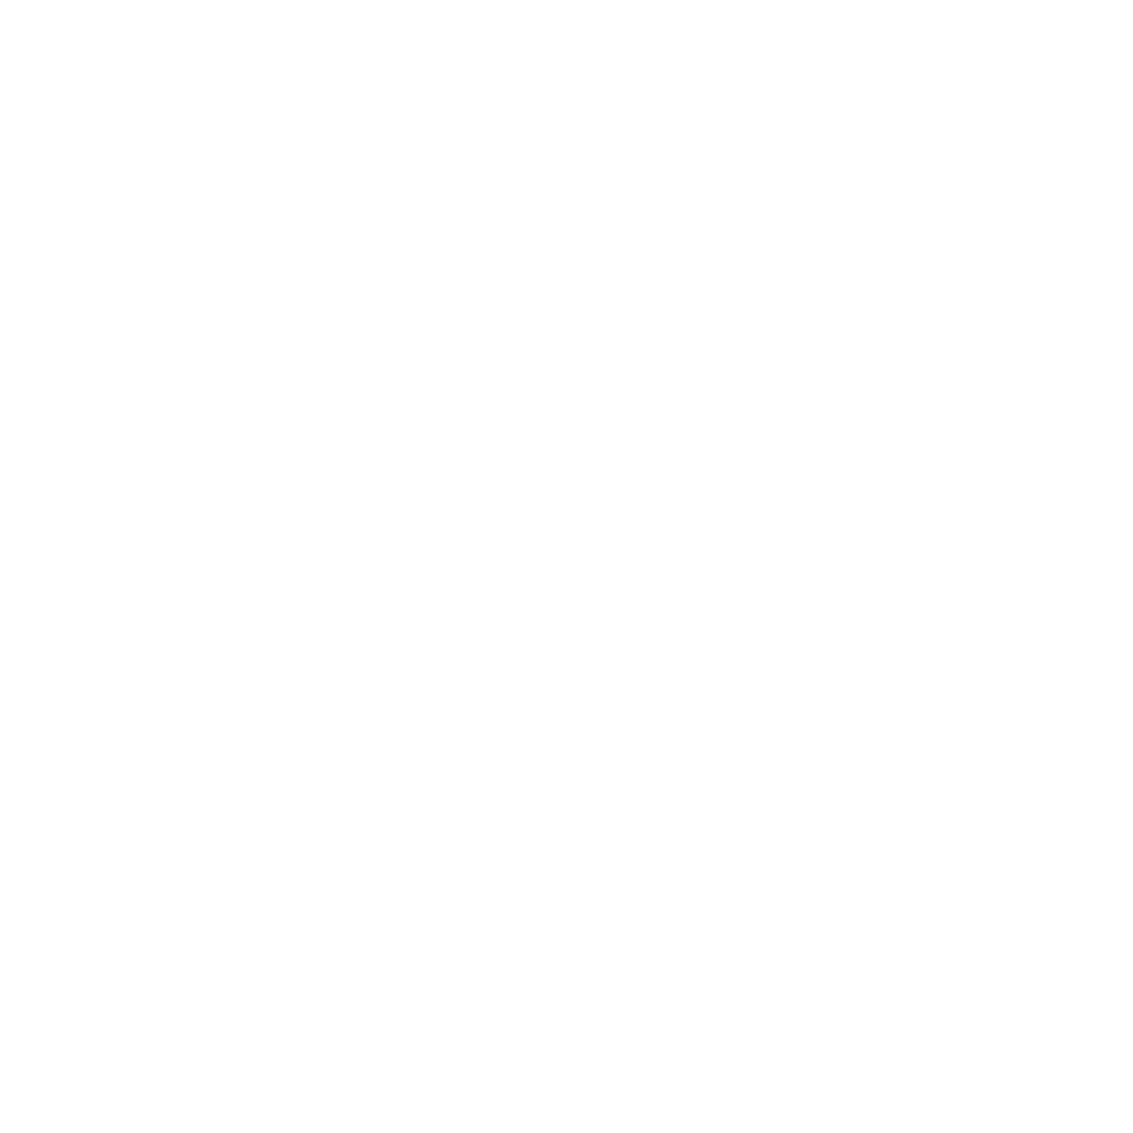 International Hemp, Marijuana, and Cannabis Consulting Firm